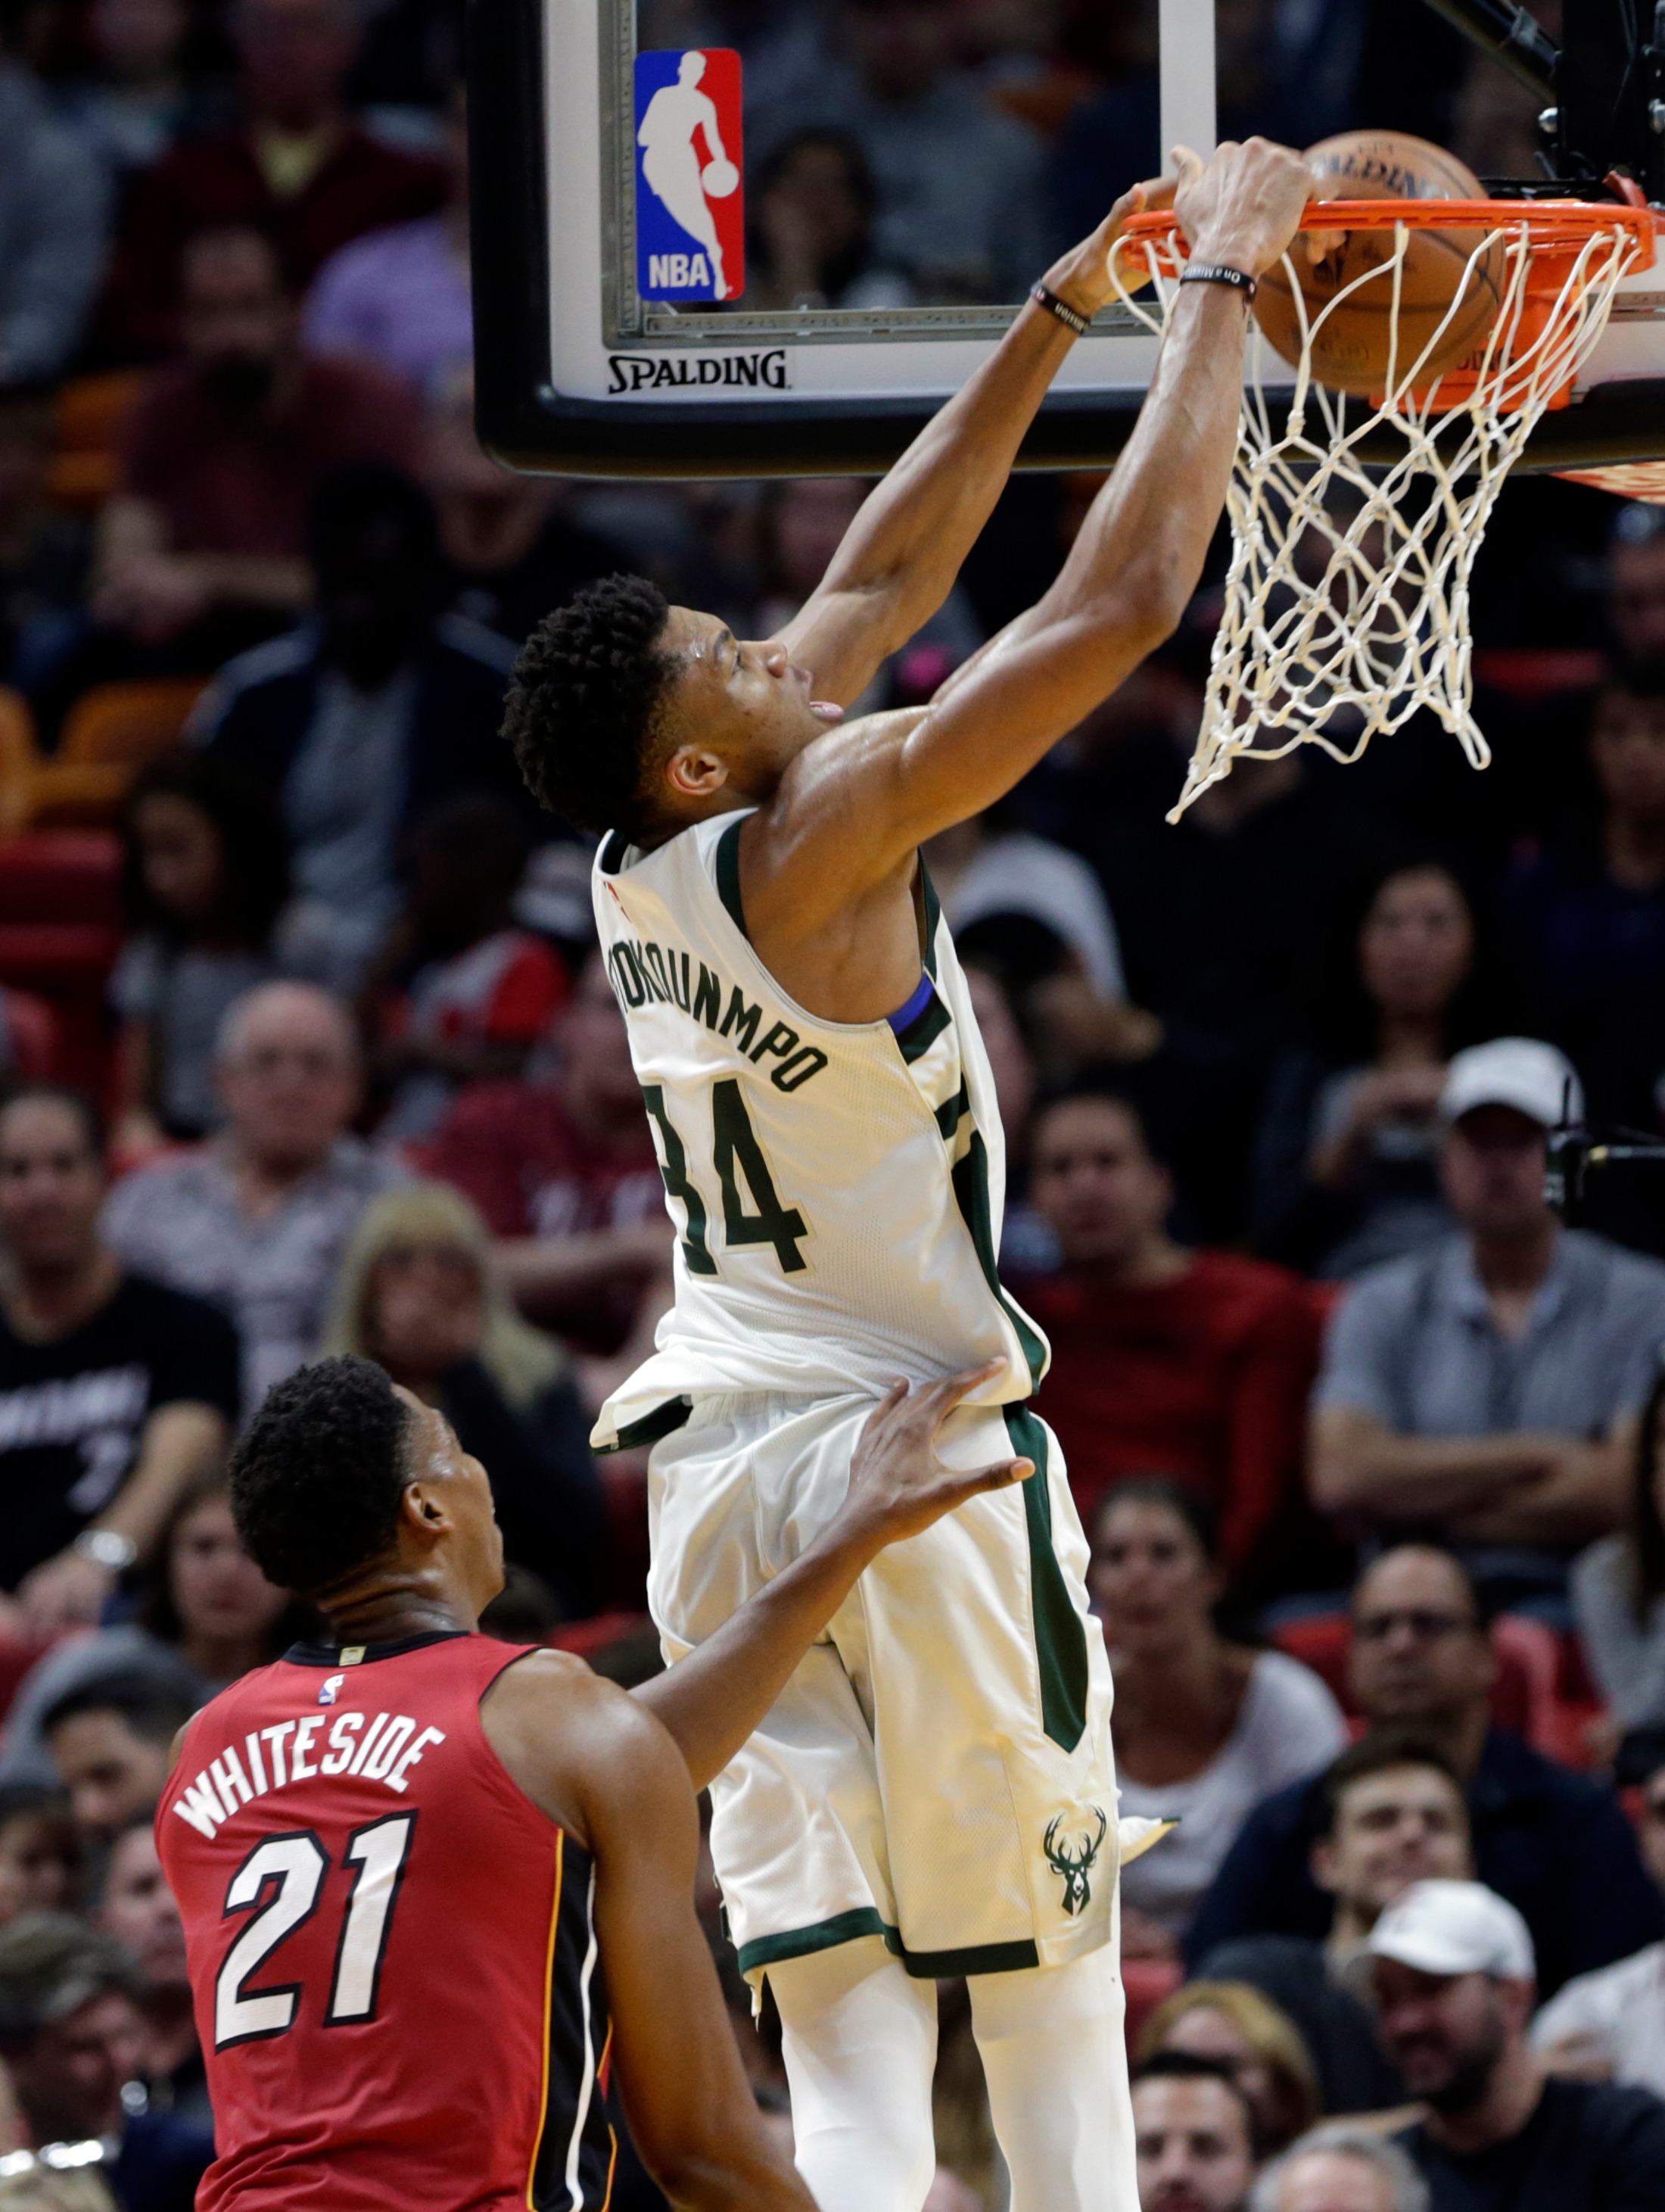 Milwaukee Bucks' Giannis Antetokounmpo (34) dunks over Miami Heat's Hassan Whiteside (21) during the second half of an NBA basketball game, Sunday, Jan. 14, 2018, in Miami. (AP Photo/Lynne Sladky)